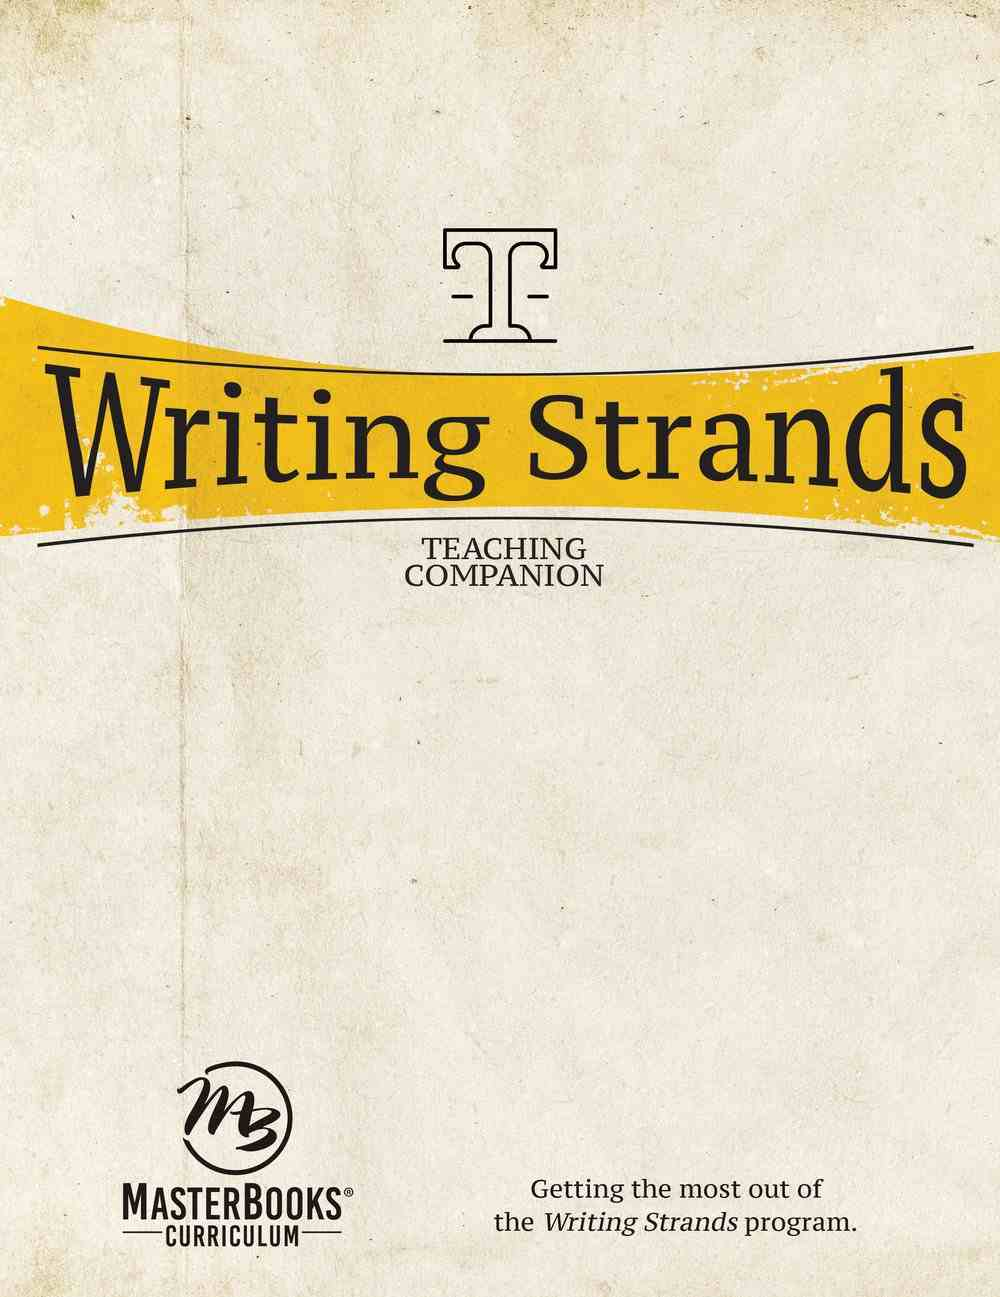 Writing Strands (Teaching Companion) (Writing Strands Series) Paperback